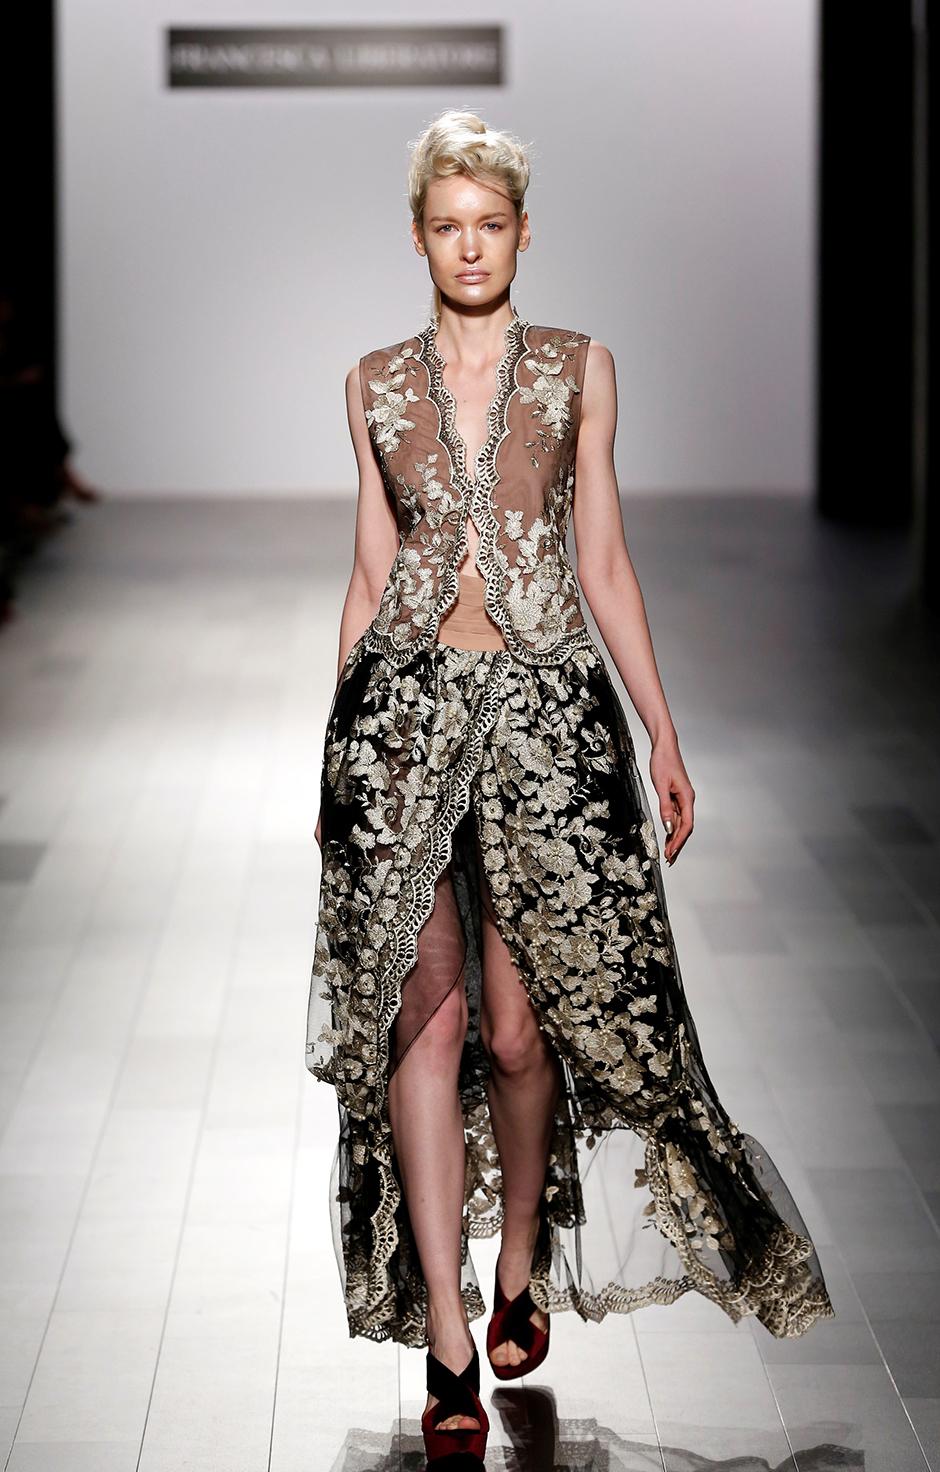 #franancescalibertore #nyfw #nyfwdesigner #nyfw17 #ss18 #newyork #fashionweek #runwayshow #trends #fashion #dresses #fashionblog #styleblog #blogger #blog #fashionblogger #trends #lacedress #fashiontrends